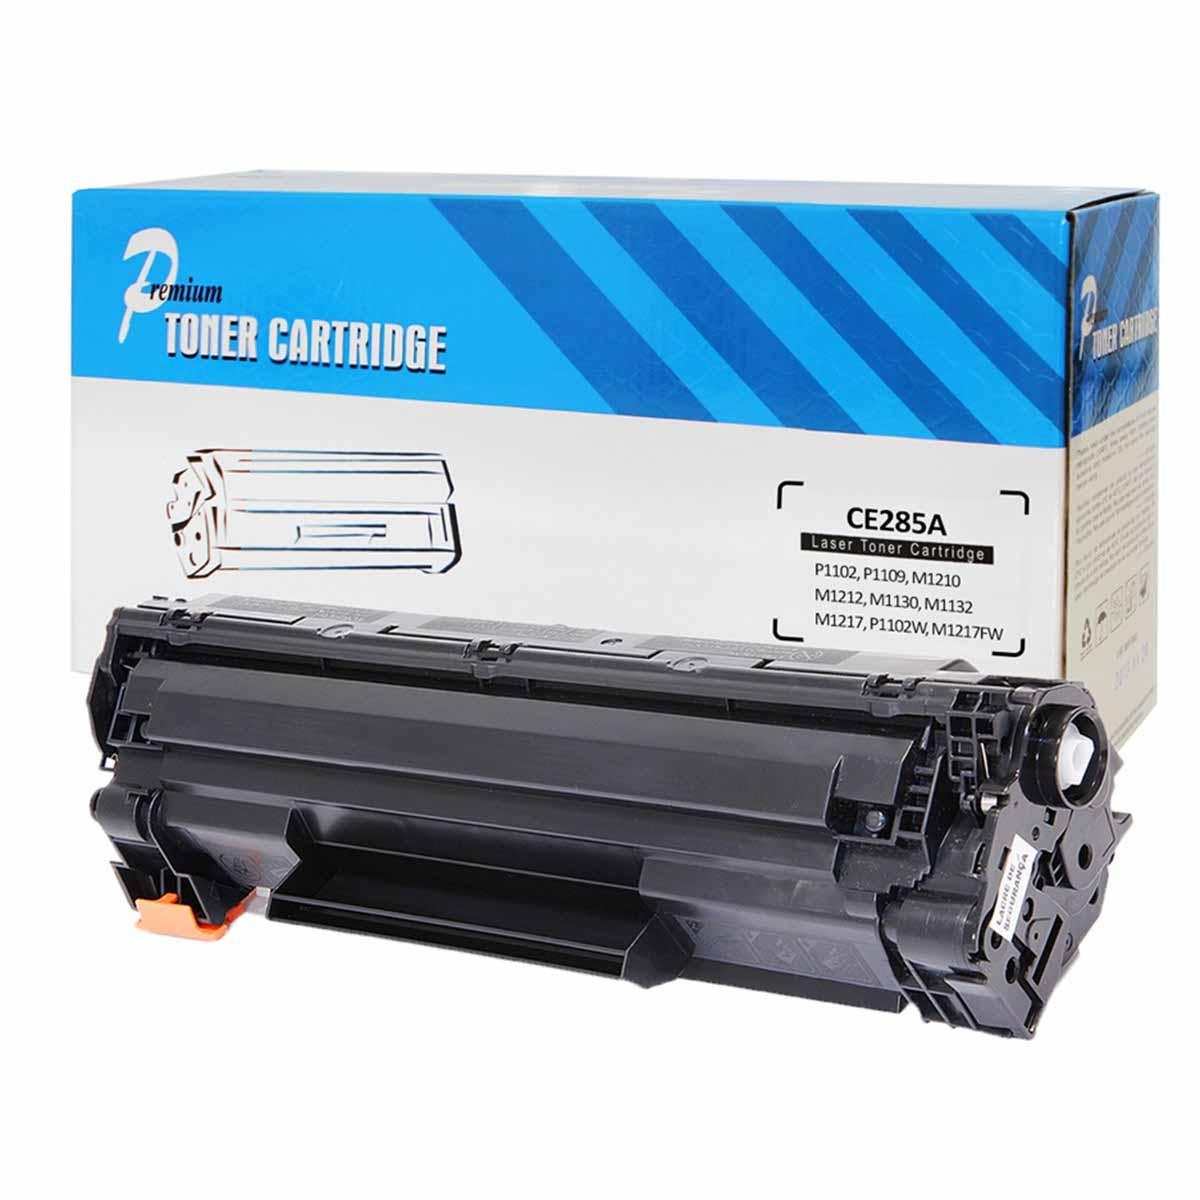 CARTUCHO HP (CE285A/85A/285A/CE285AB) P1102/P1102W/M1132/M1210/M1212 COMPATÍVEL